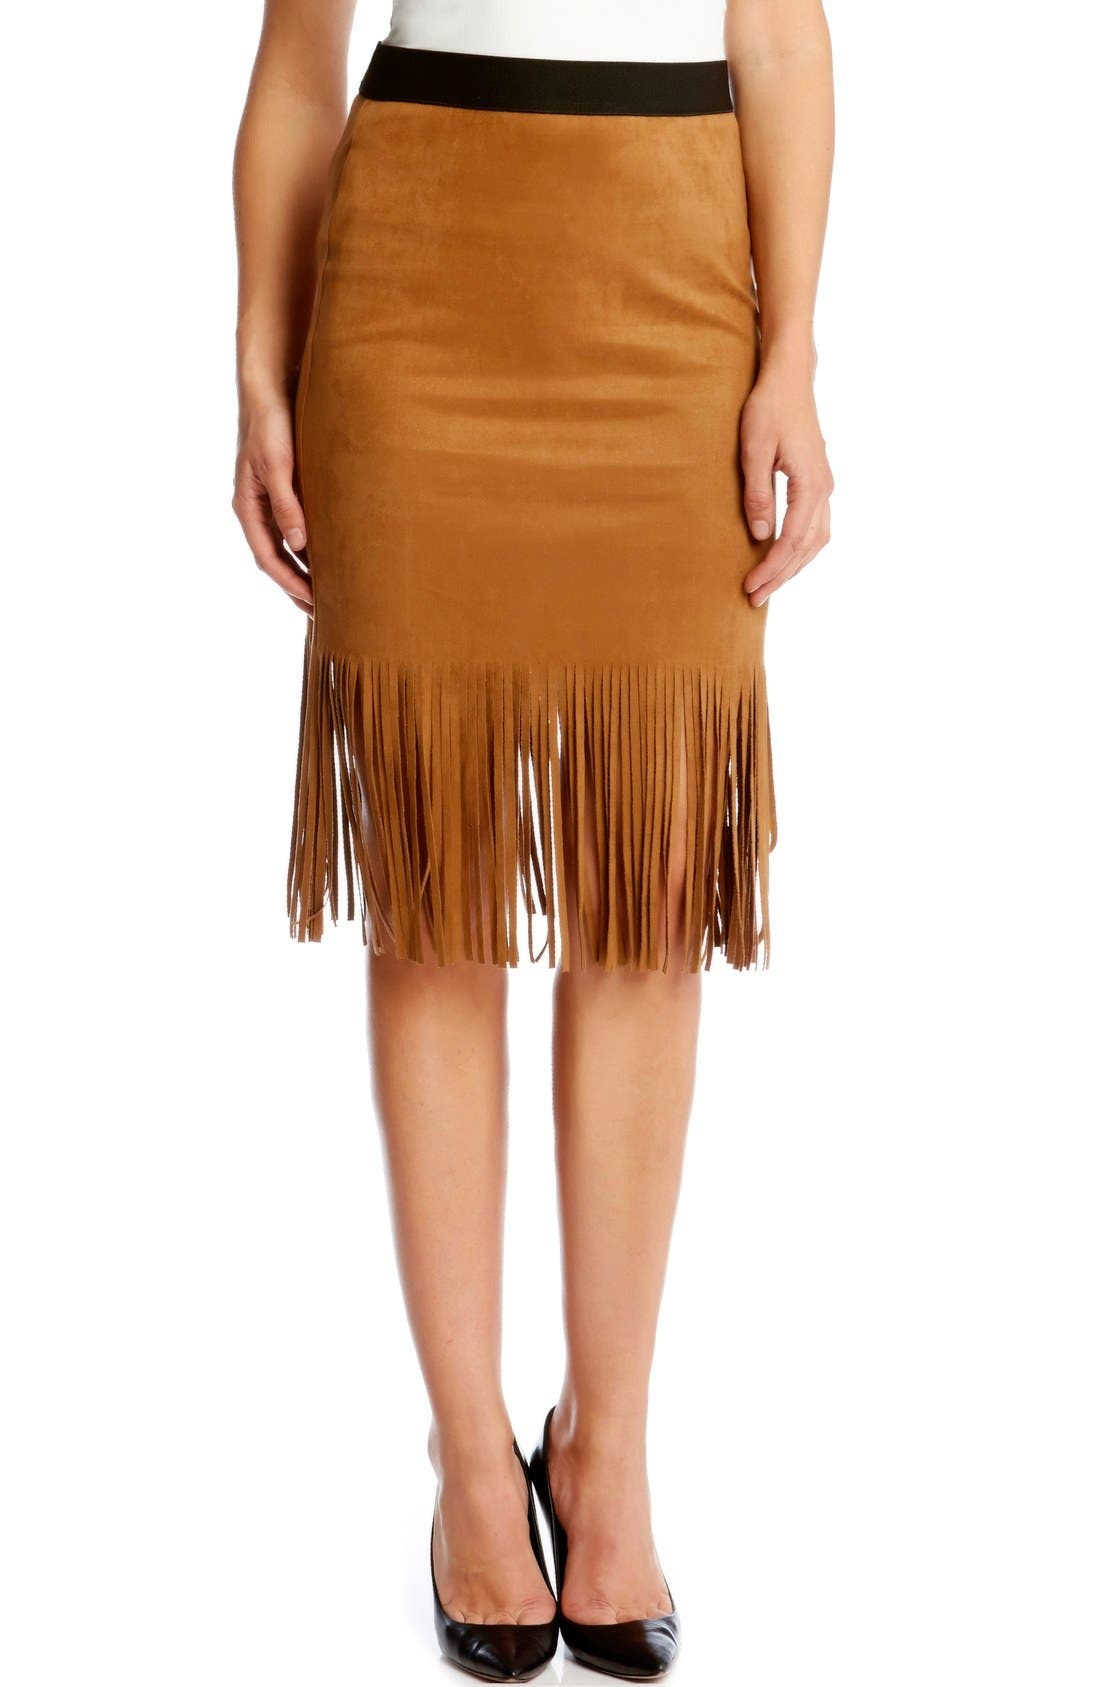 Main Image - Karen Kane Faux Suede Midi Pencil Skirt with Fringe